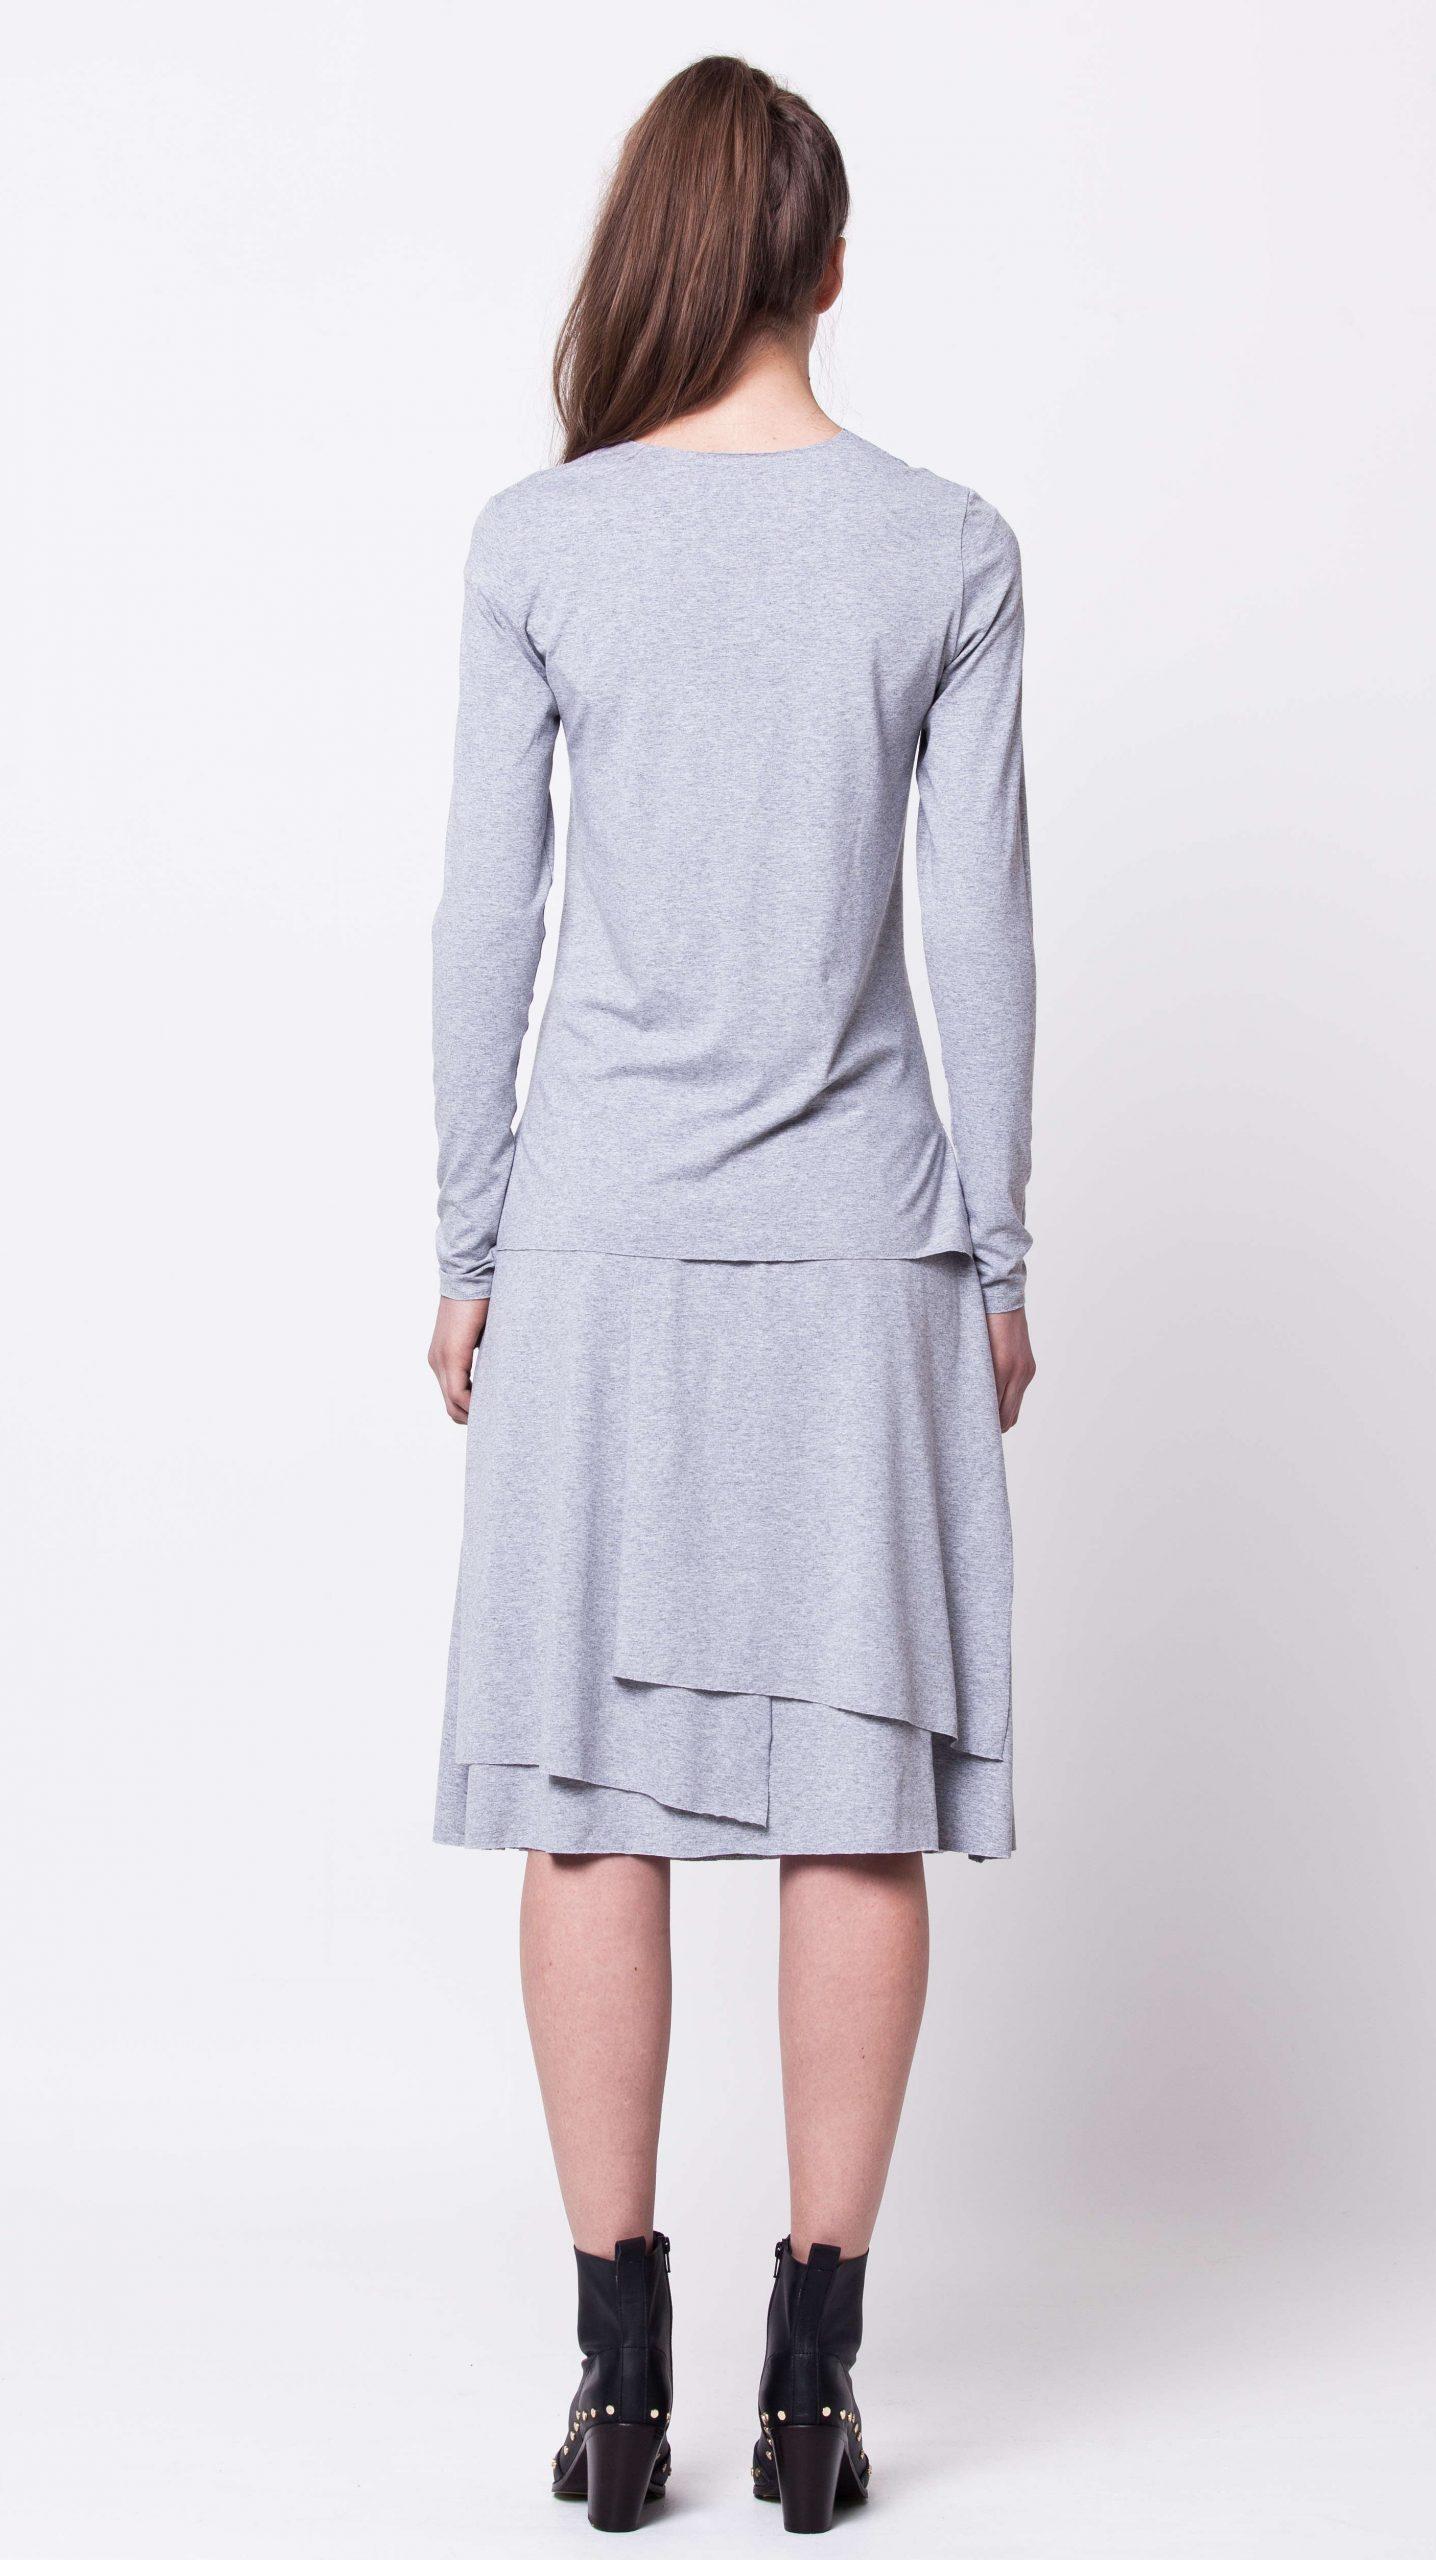 Grey layered jersey womens ladies skirt top set damen grauer rock HANNA GREY